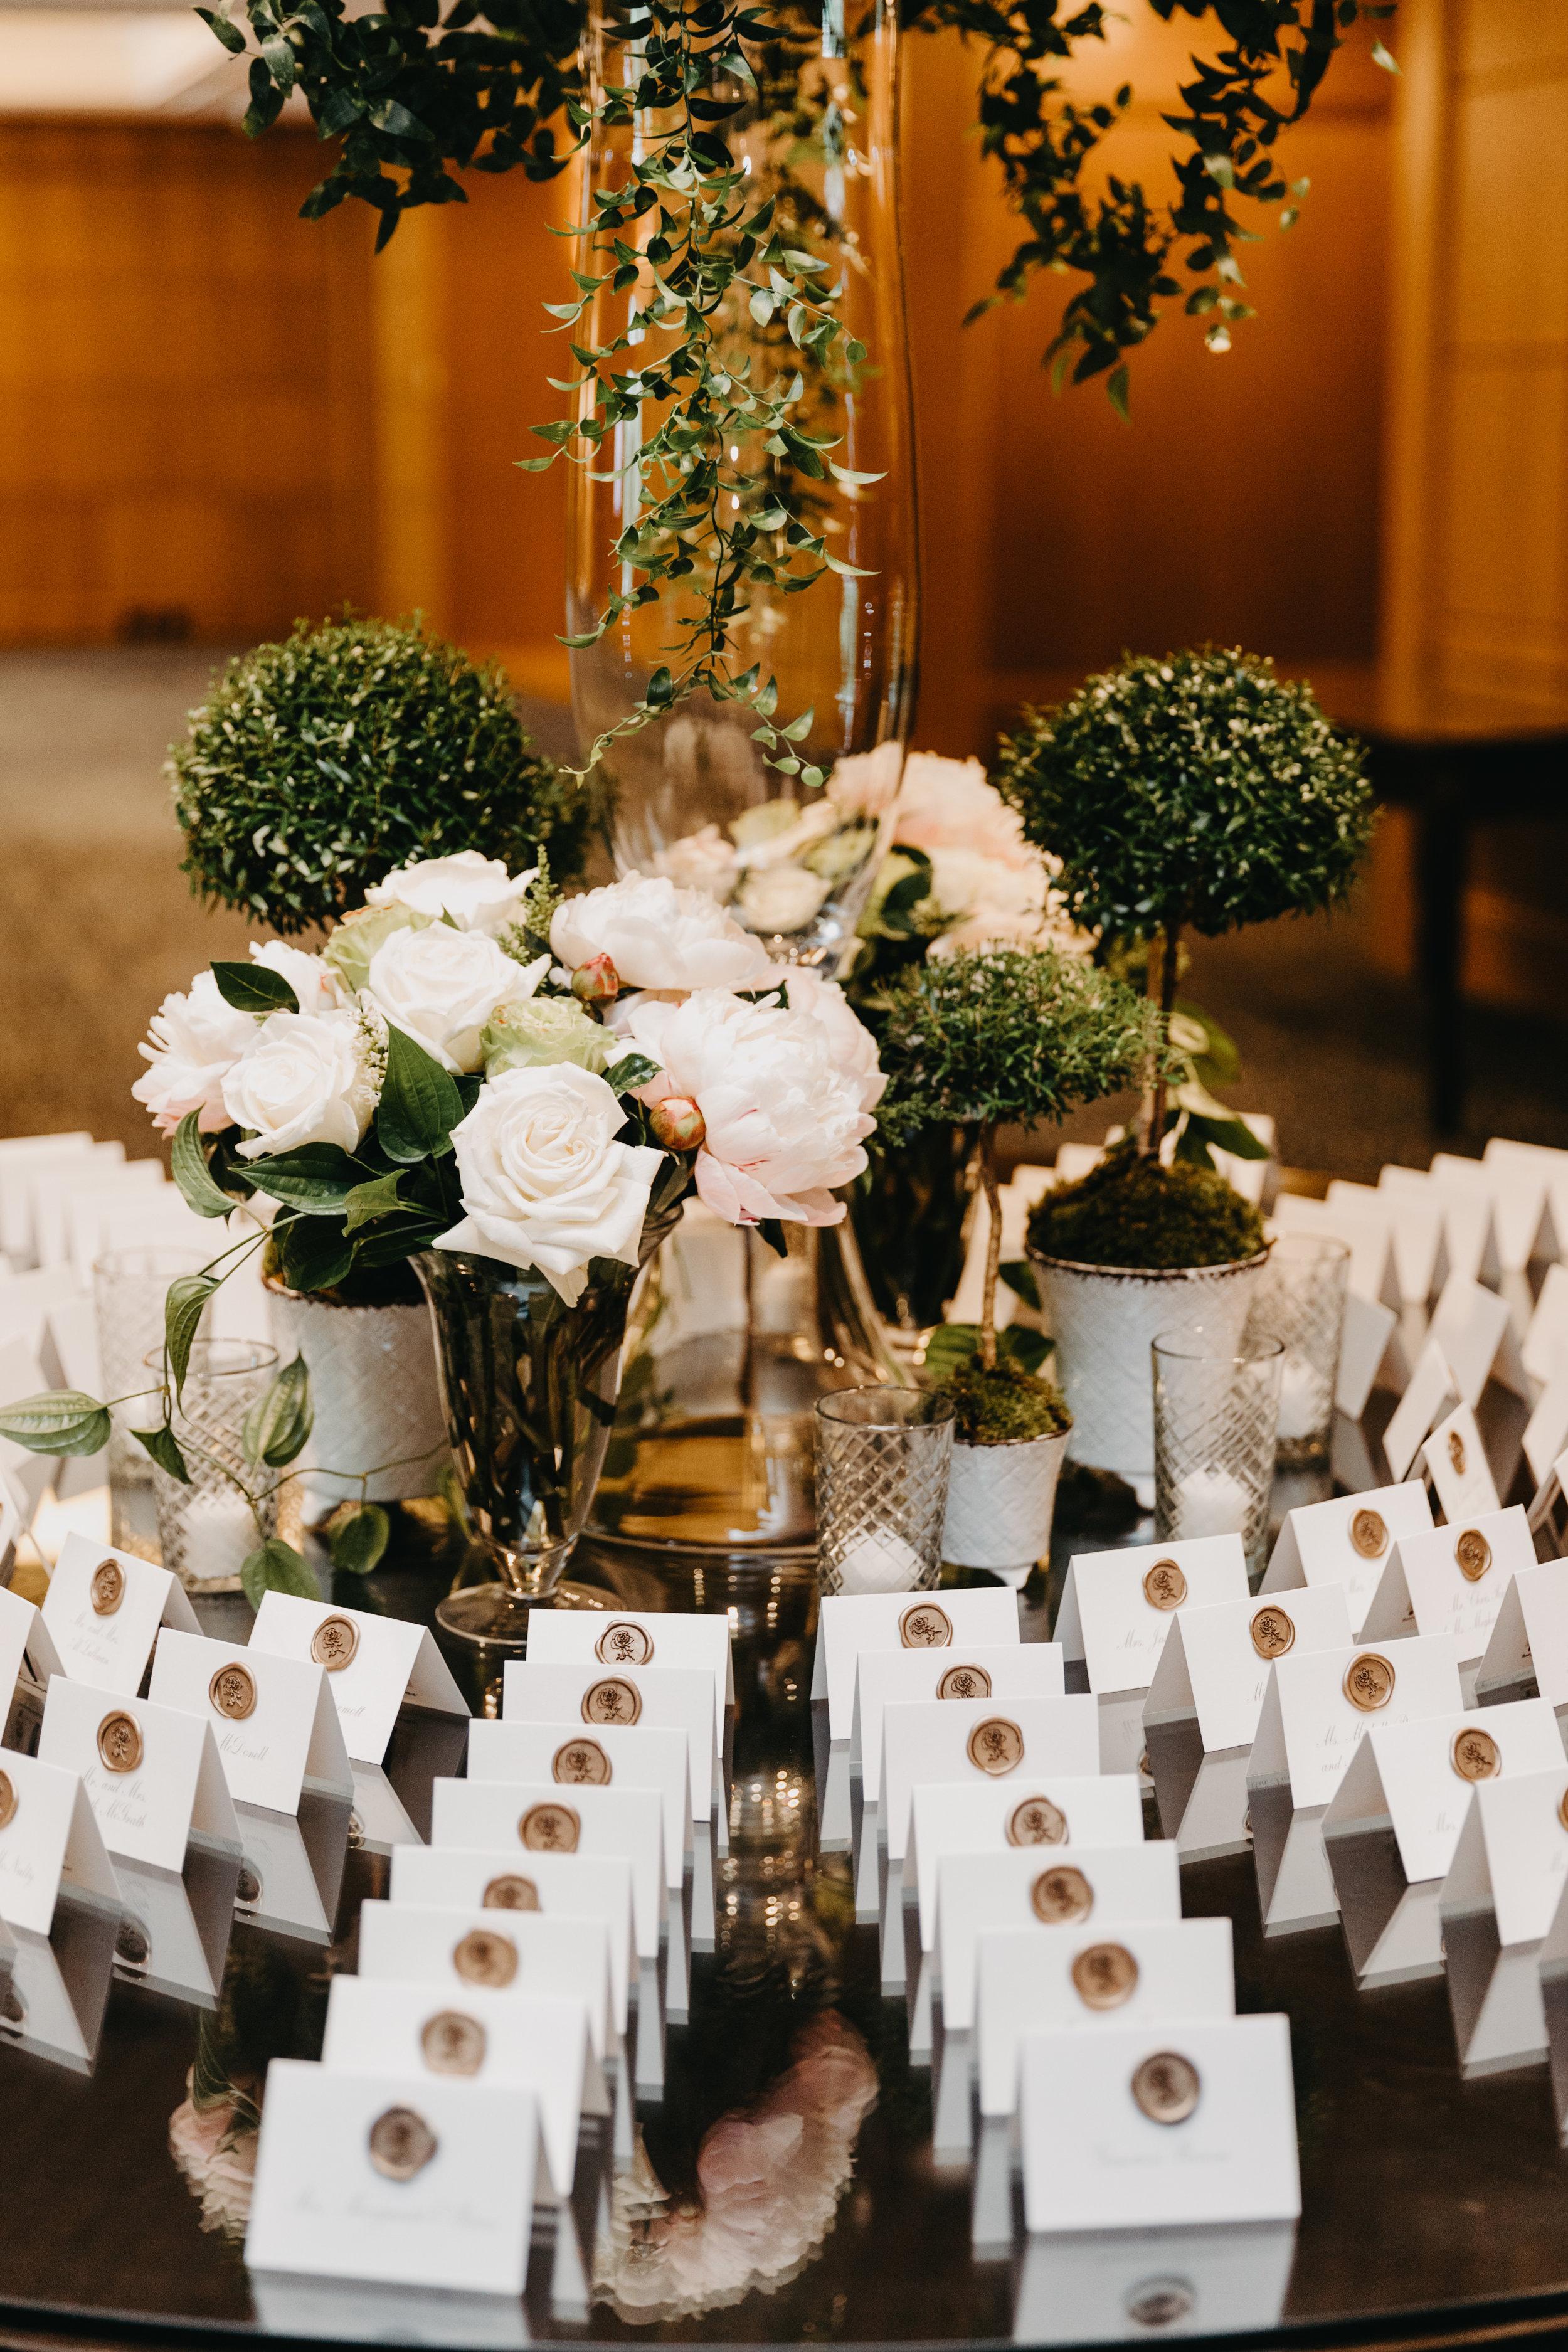 BOSTON PUBLIC GARDEN WEDDING, GARDEN WEDDING, BOSTON WEDDING PLANNER, NICOLE SIMERAL, FOUR SEASONS WEDDING, CLASSIC, TIMELESS, WEDDING WEDDING PLANNER, DESTINATION WEDDING, ECORT CARD TABLE ,DETAILS, TOPIARIES, GARDEN ROSES, PEONIES, SPRING WEDDING, BLUSH, NUDE, CLEMATIS